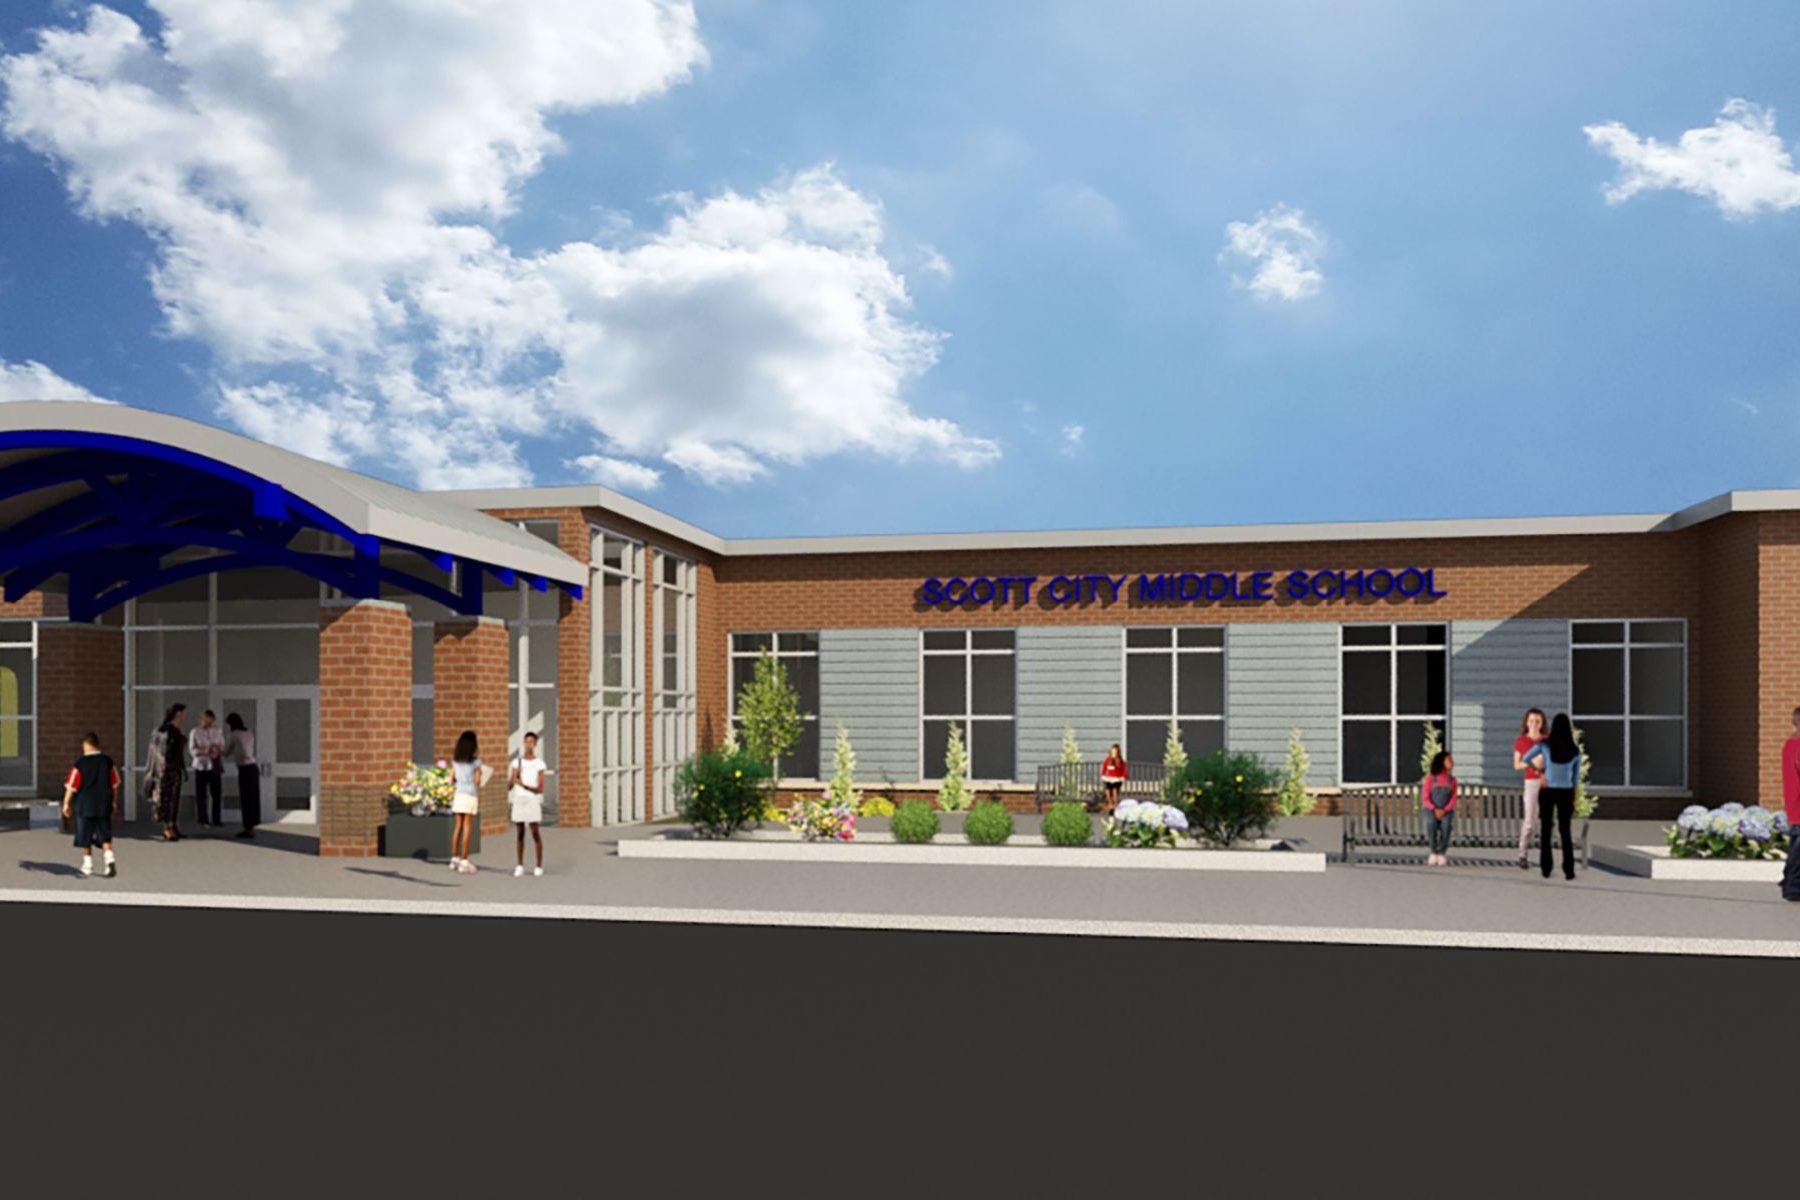 Final Scott city Middle School front entry - Copy